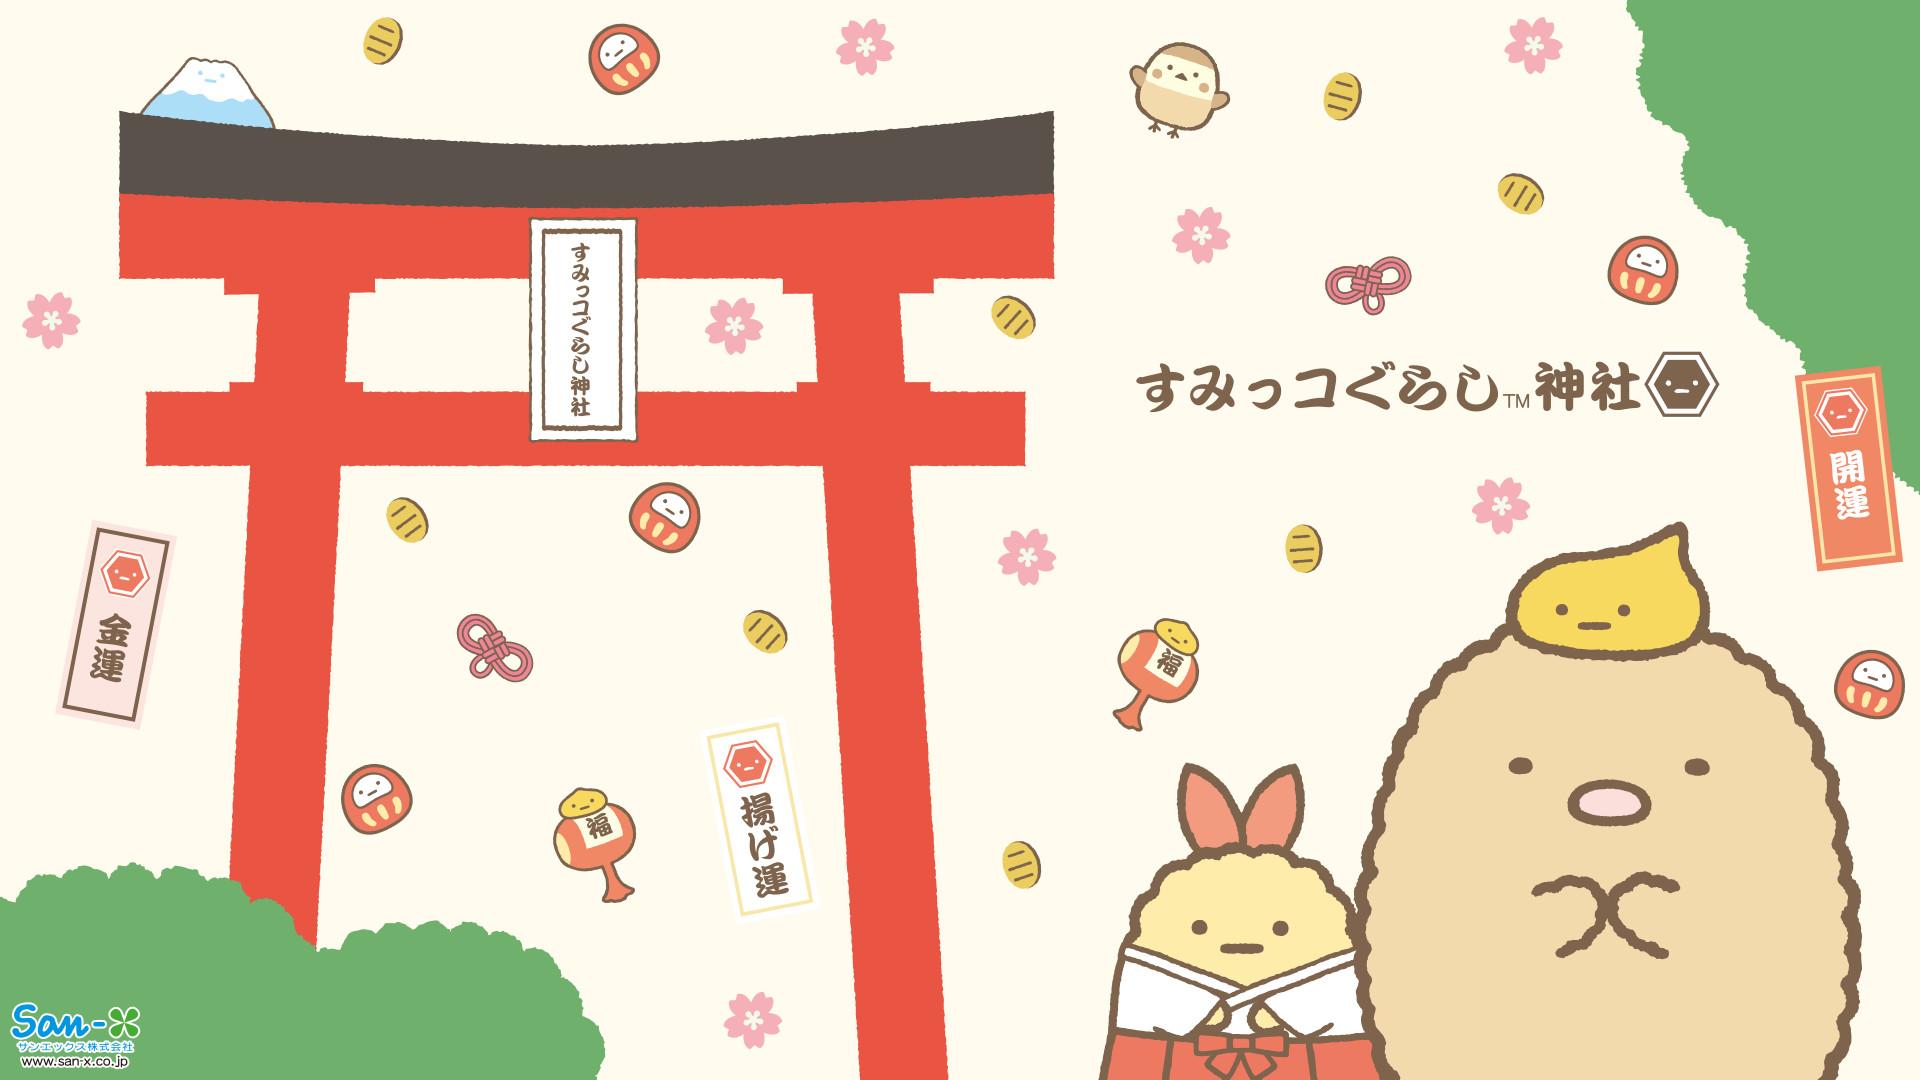 Explore Kawaii Stuff, Desktop Wallpapers and more!